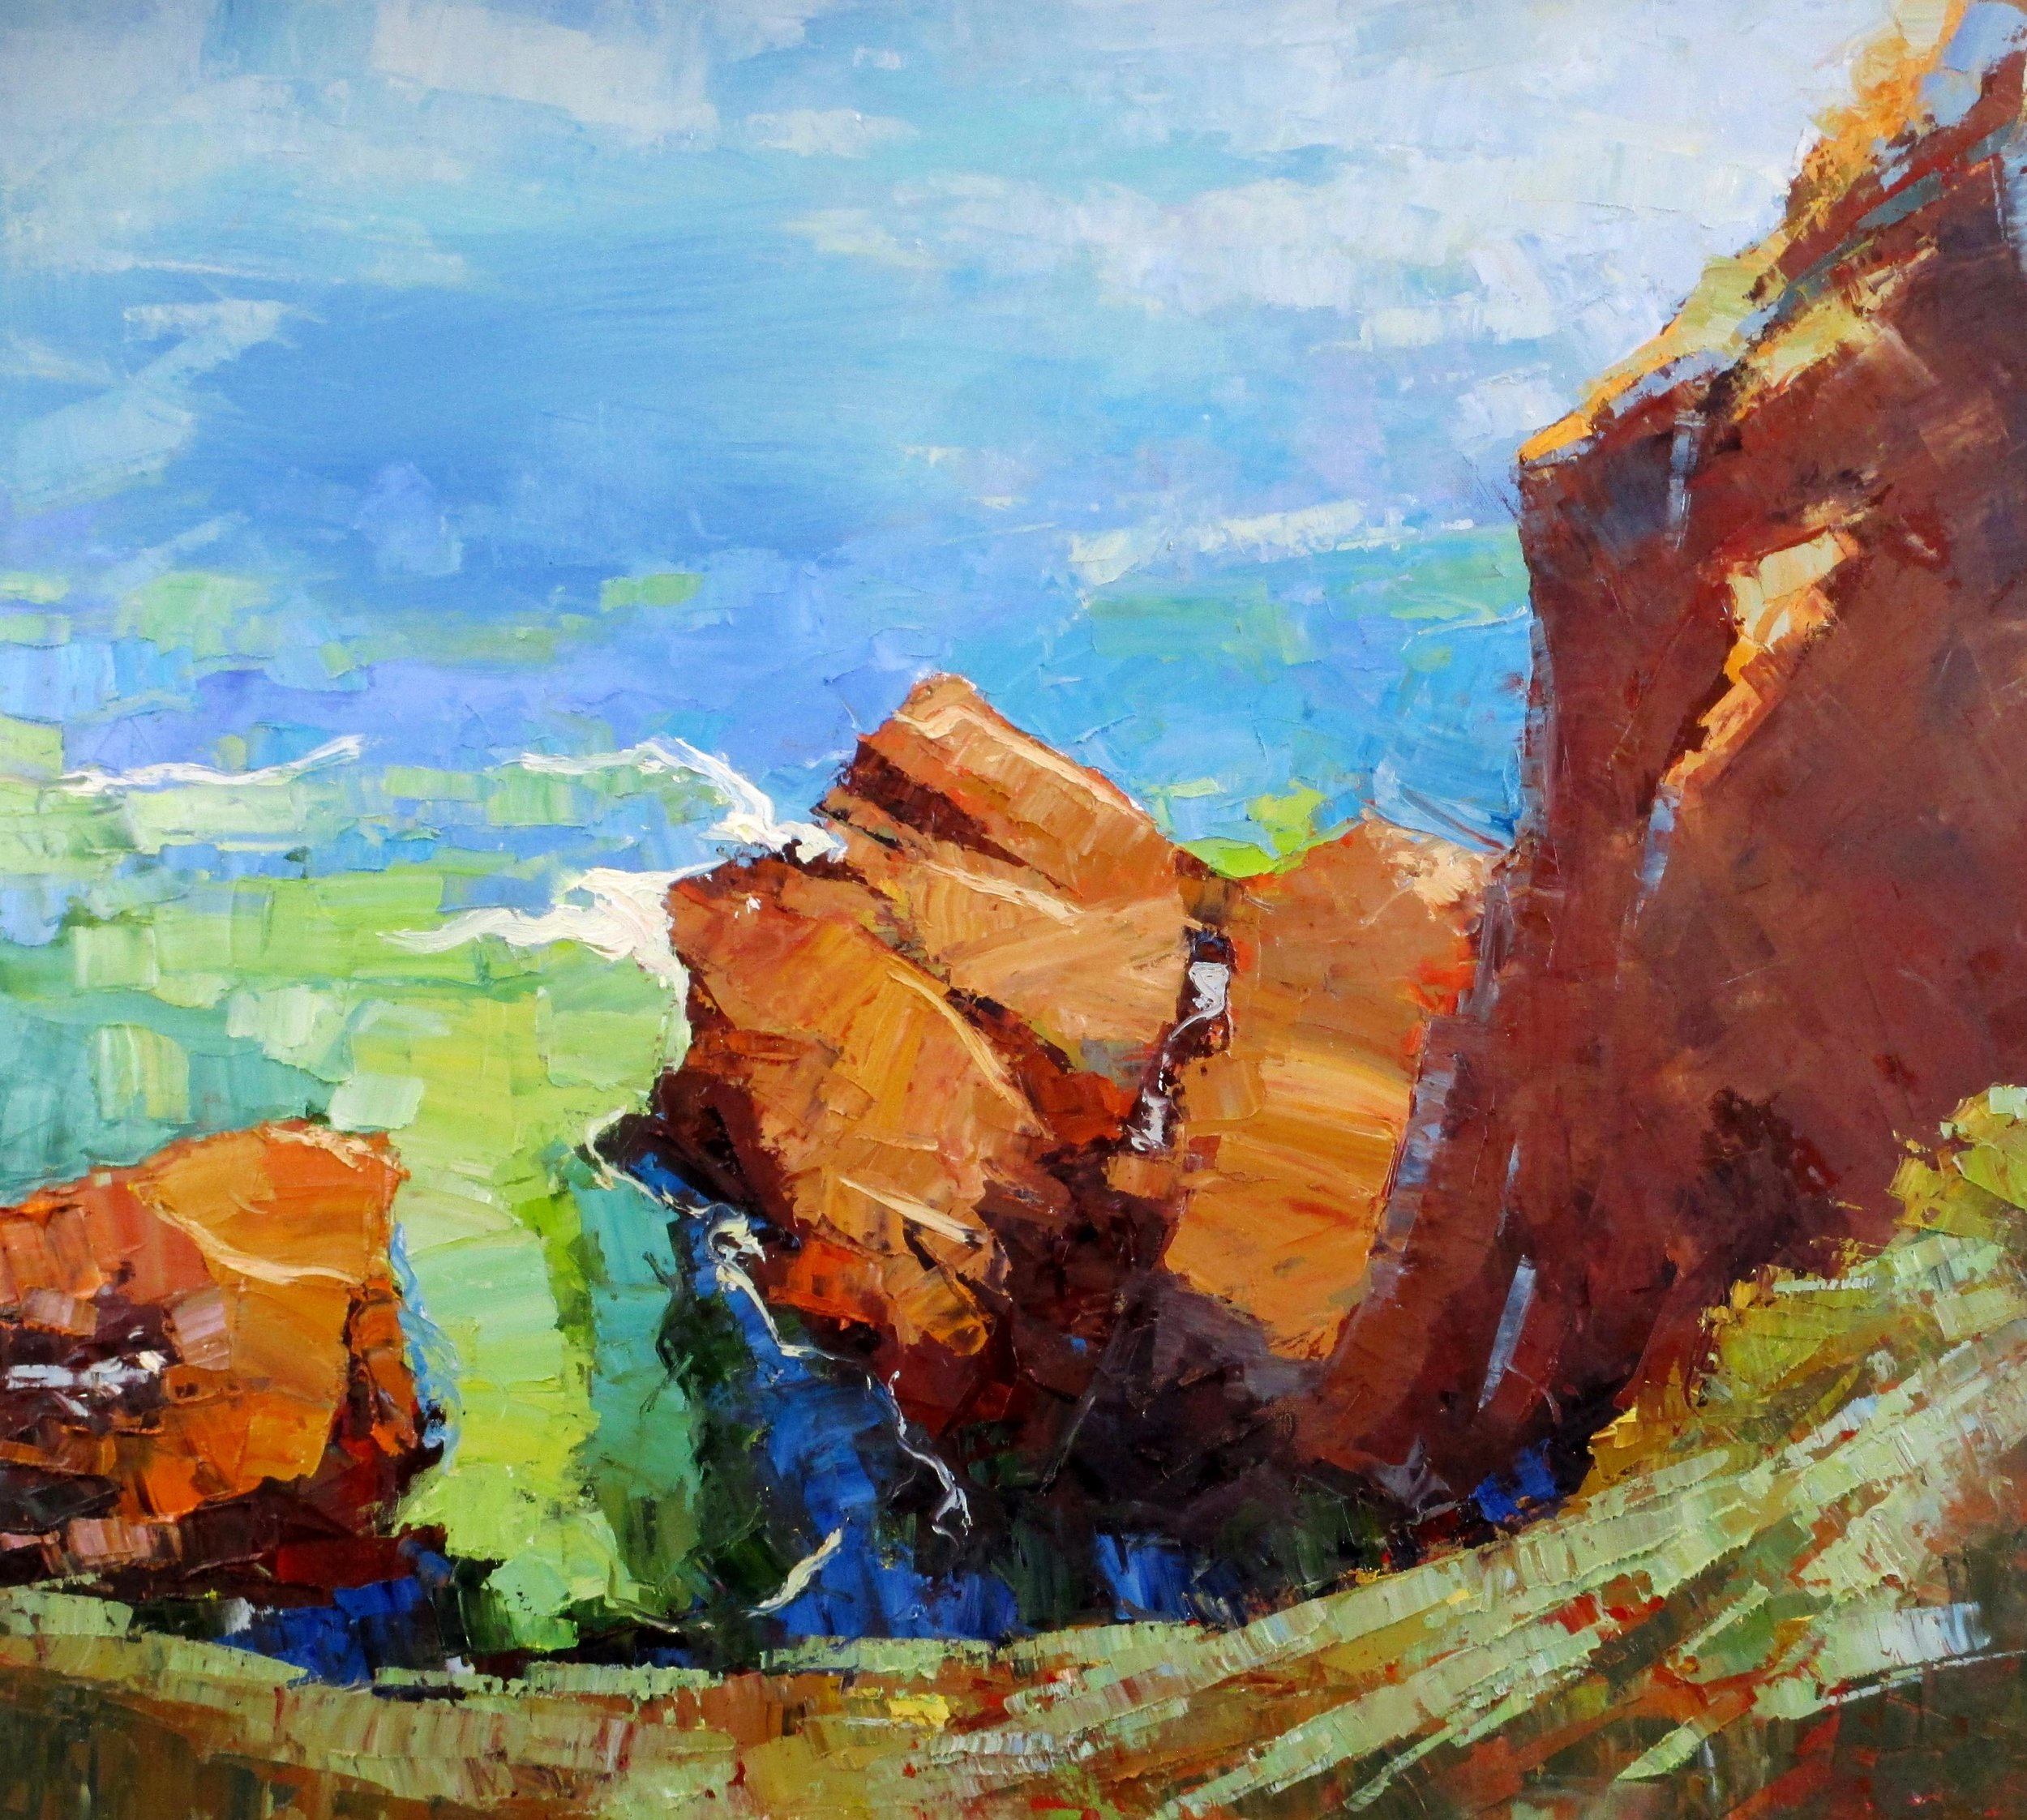 Mendocino Colors, 30 x 40 inches, oil.